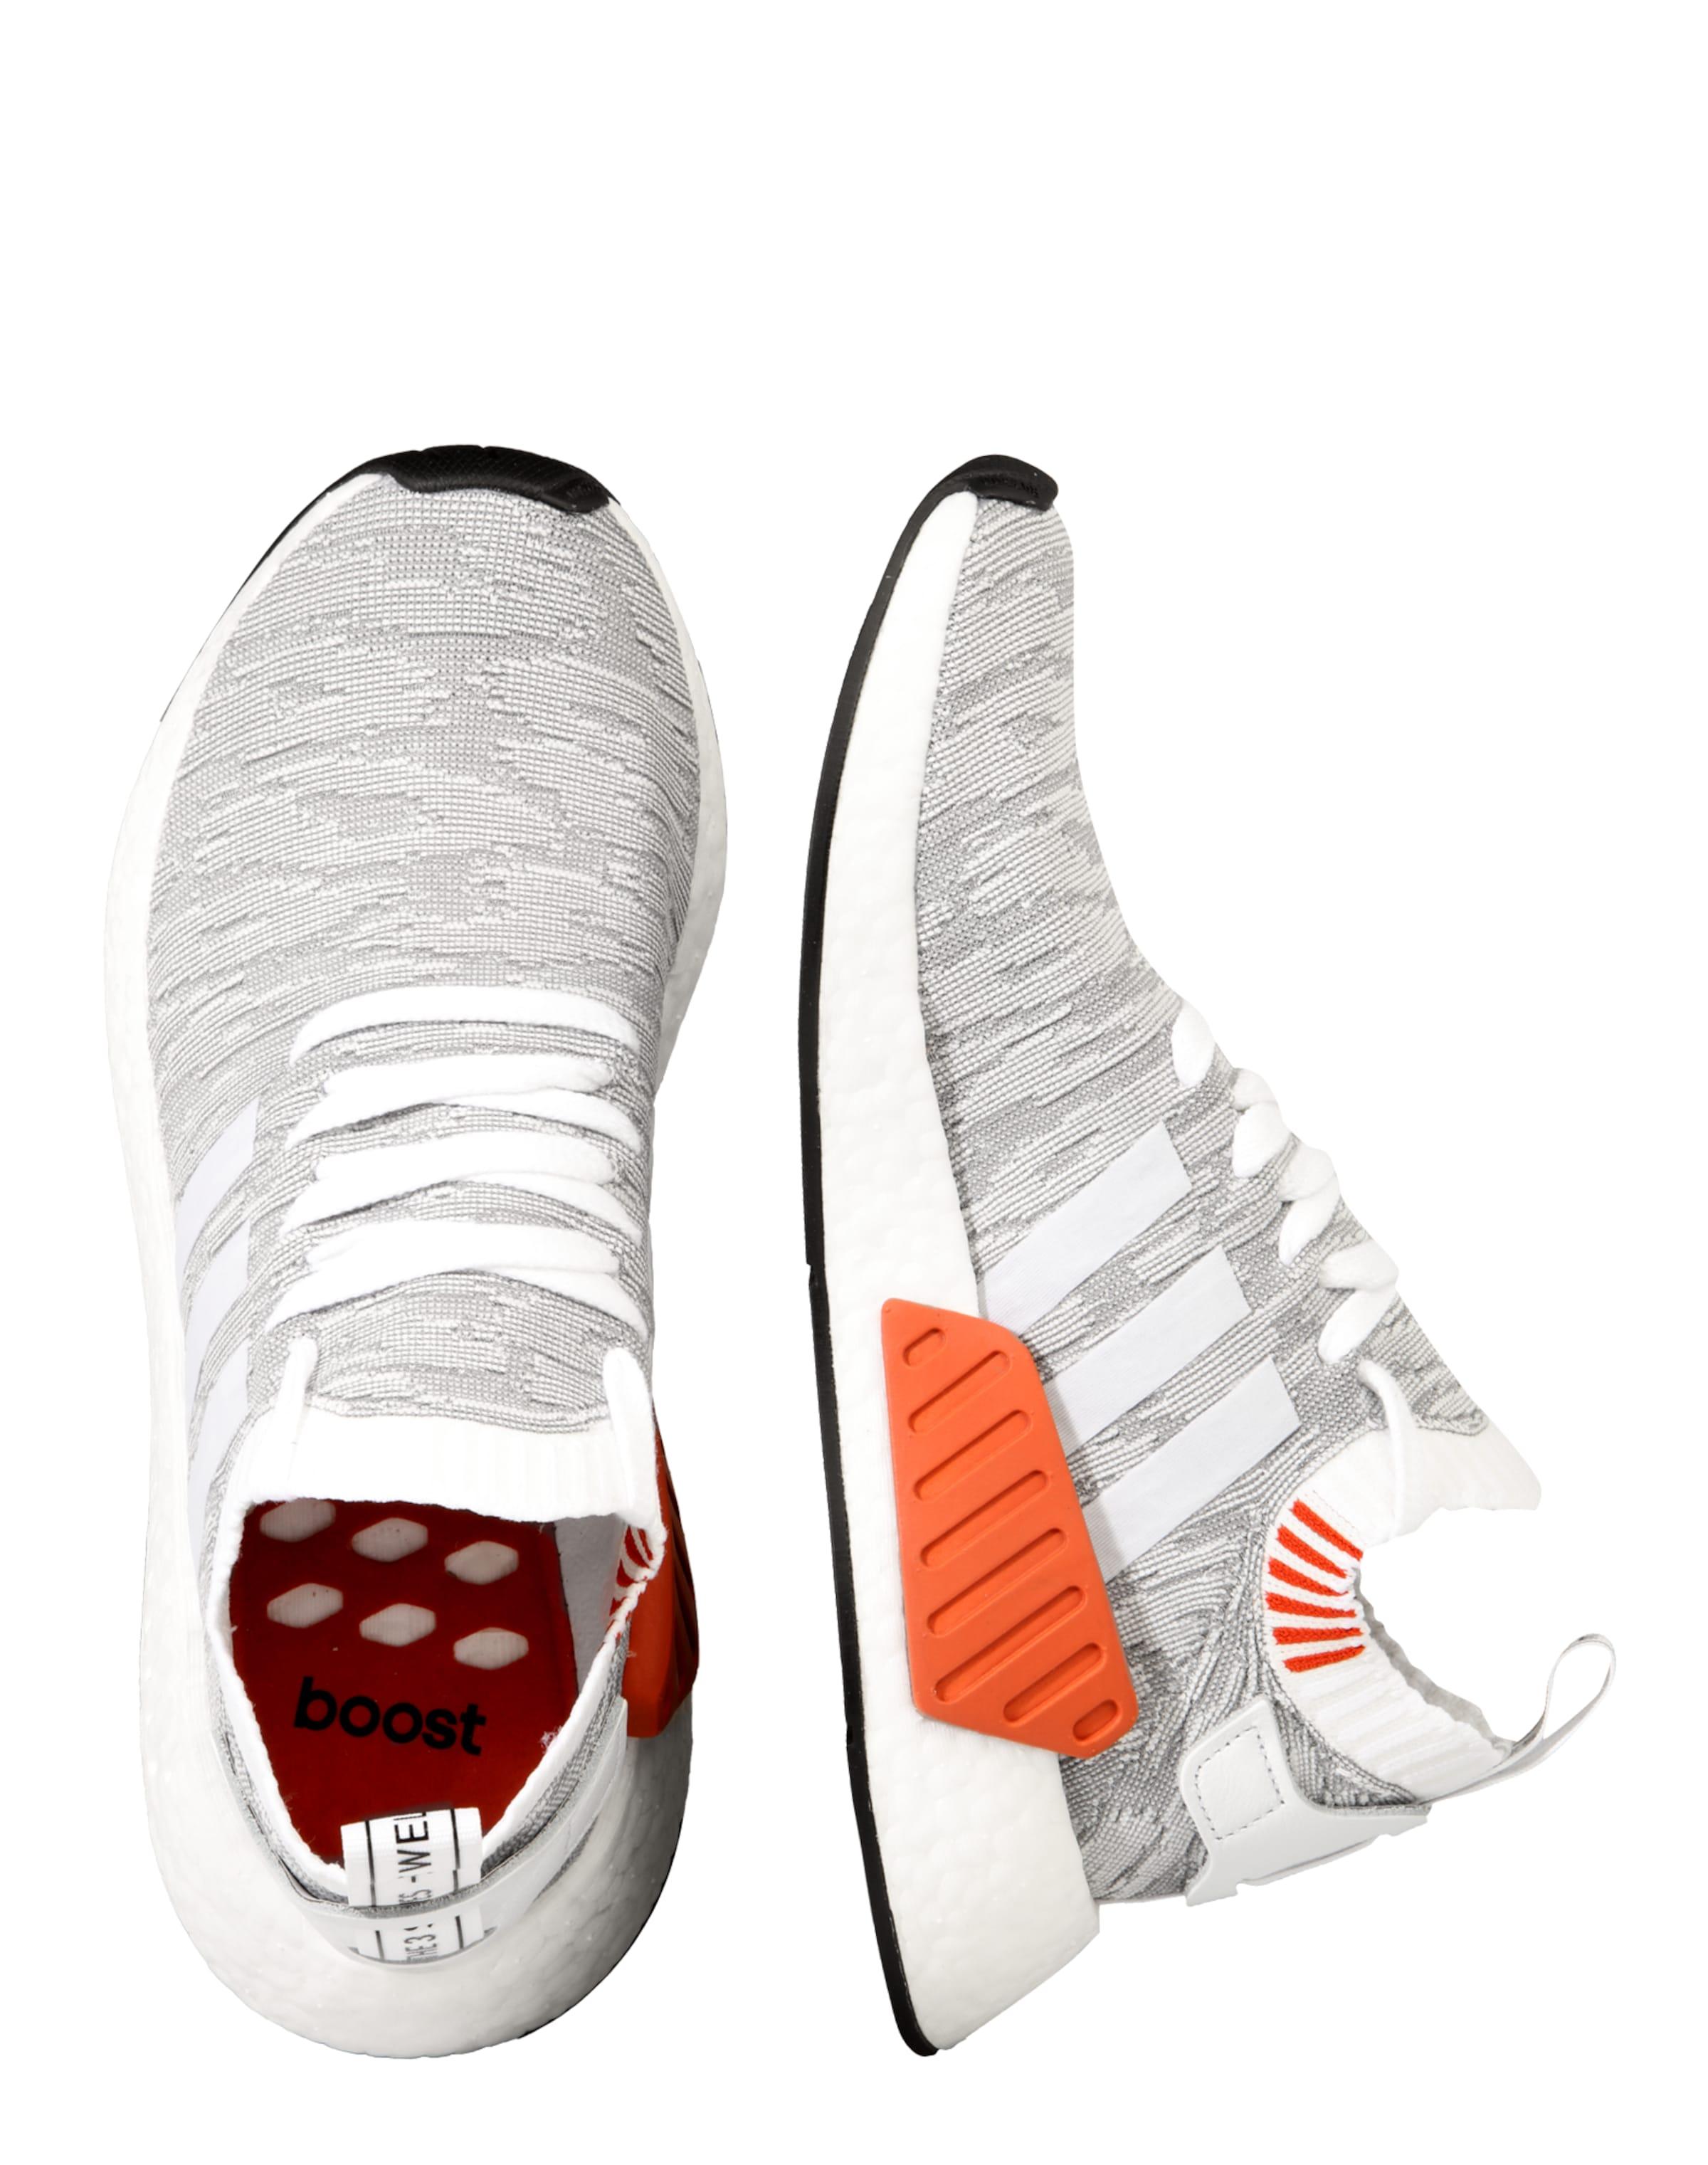 Adidas Adidas Originals Originals Sneaker Sneaker HellgrauOrange Originals In Sneaker In HellgrauOrange Adidas RjL354AqcS